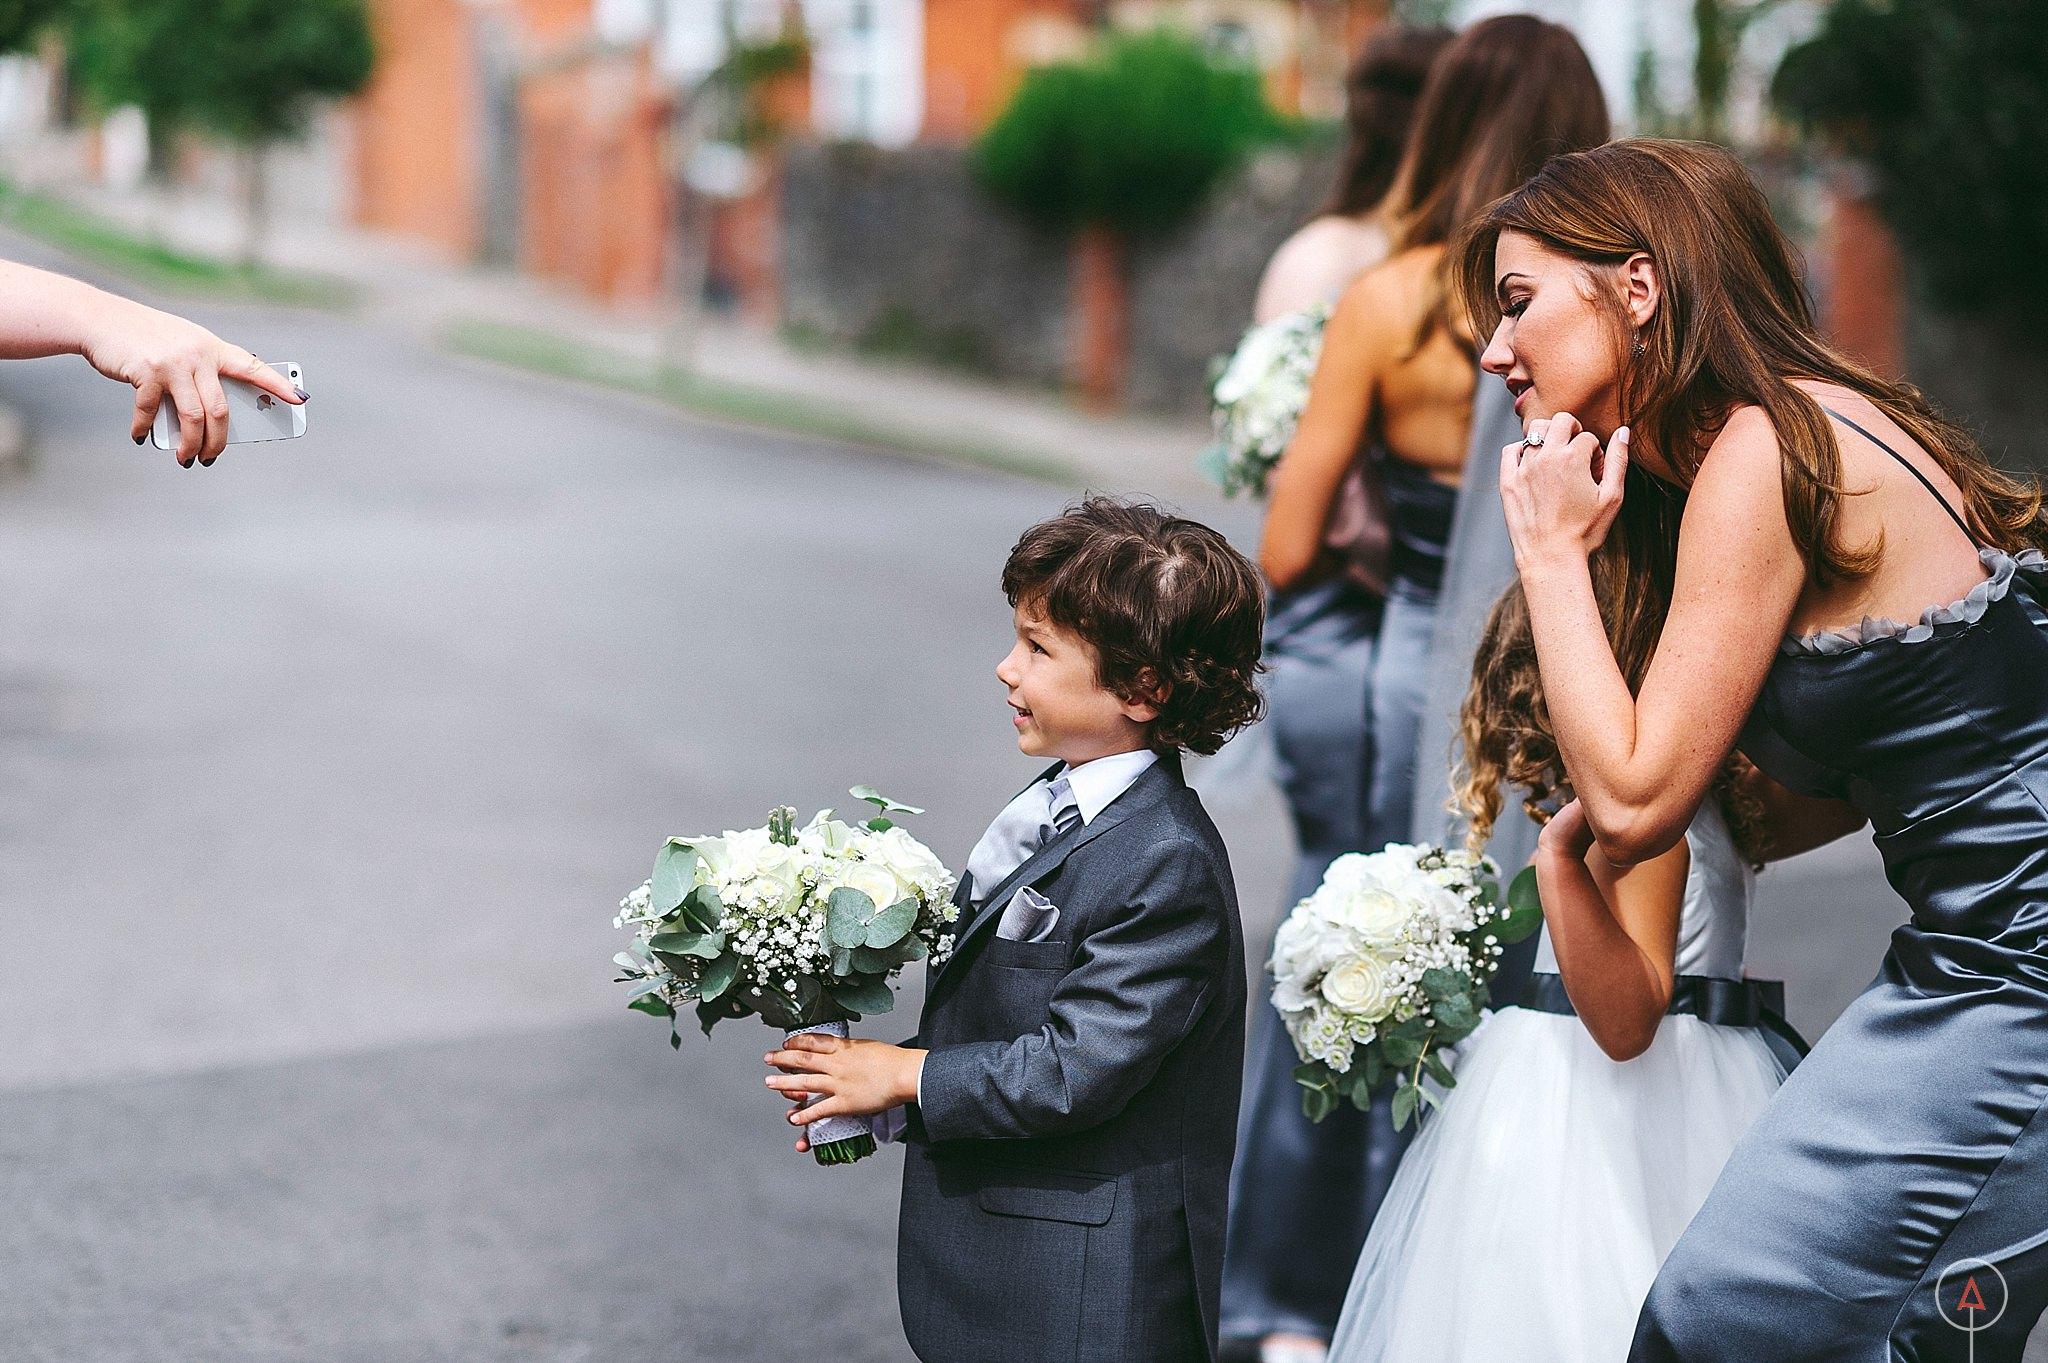 cardiff-wedding-photographer-aga-tomaszek_0359